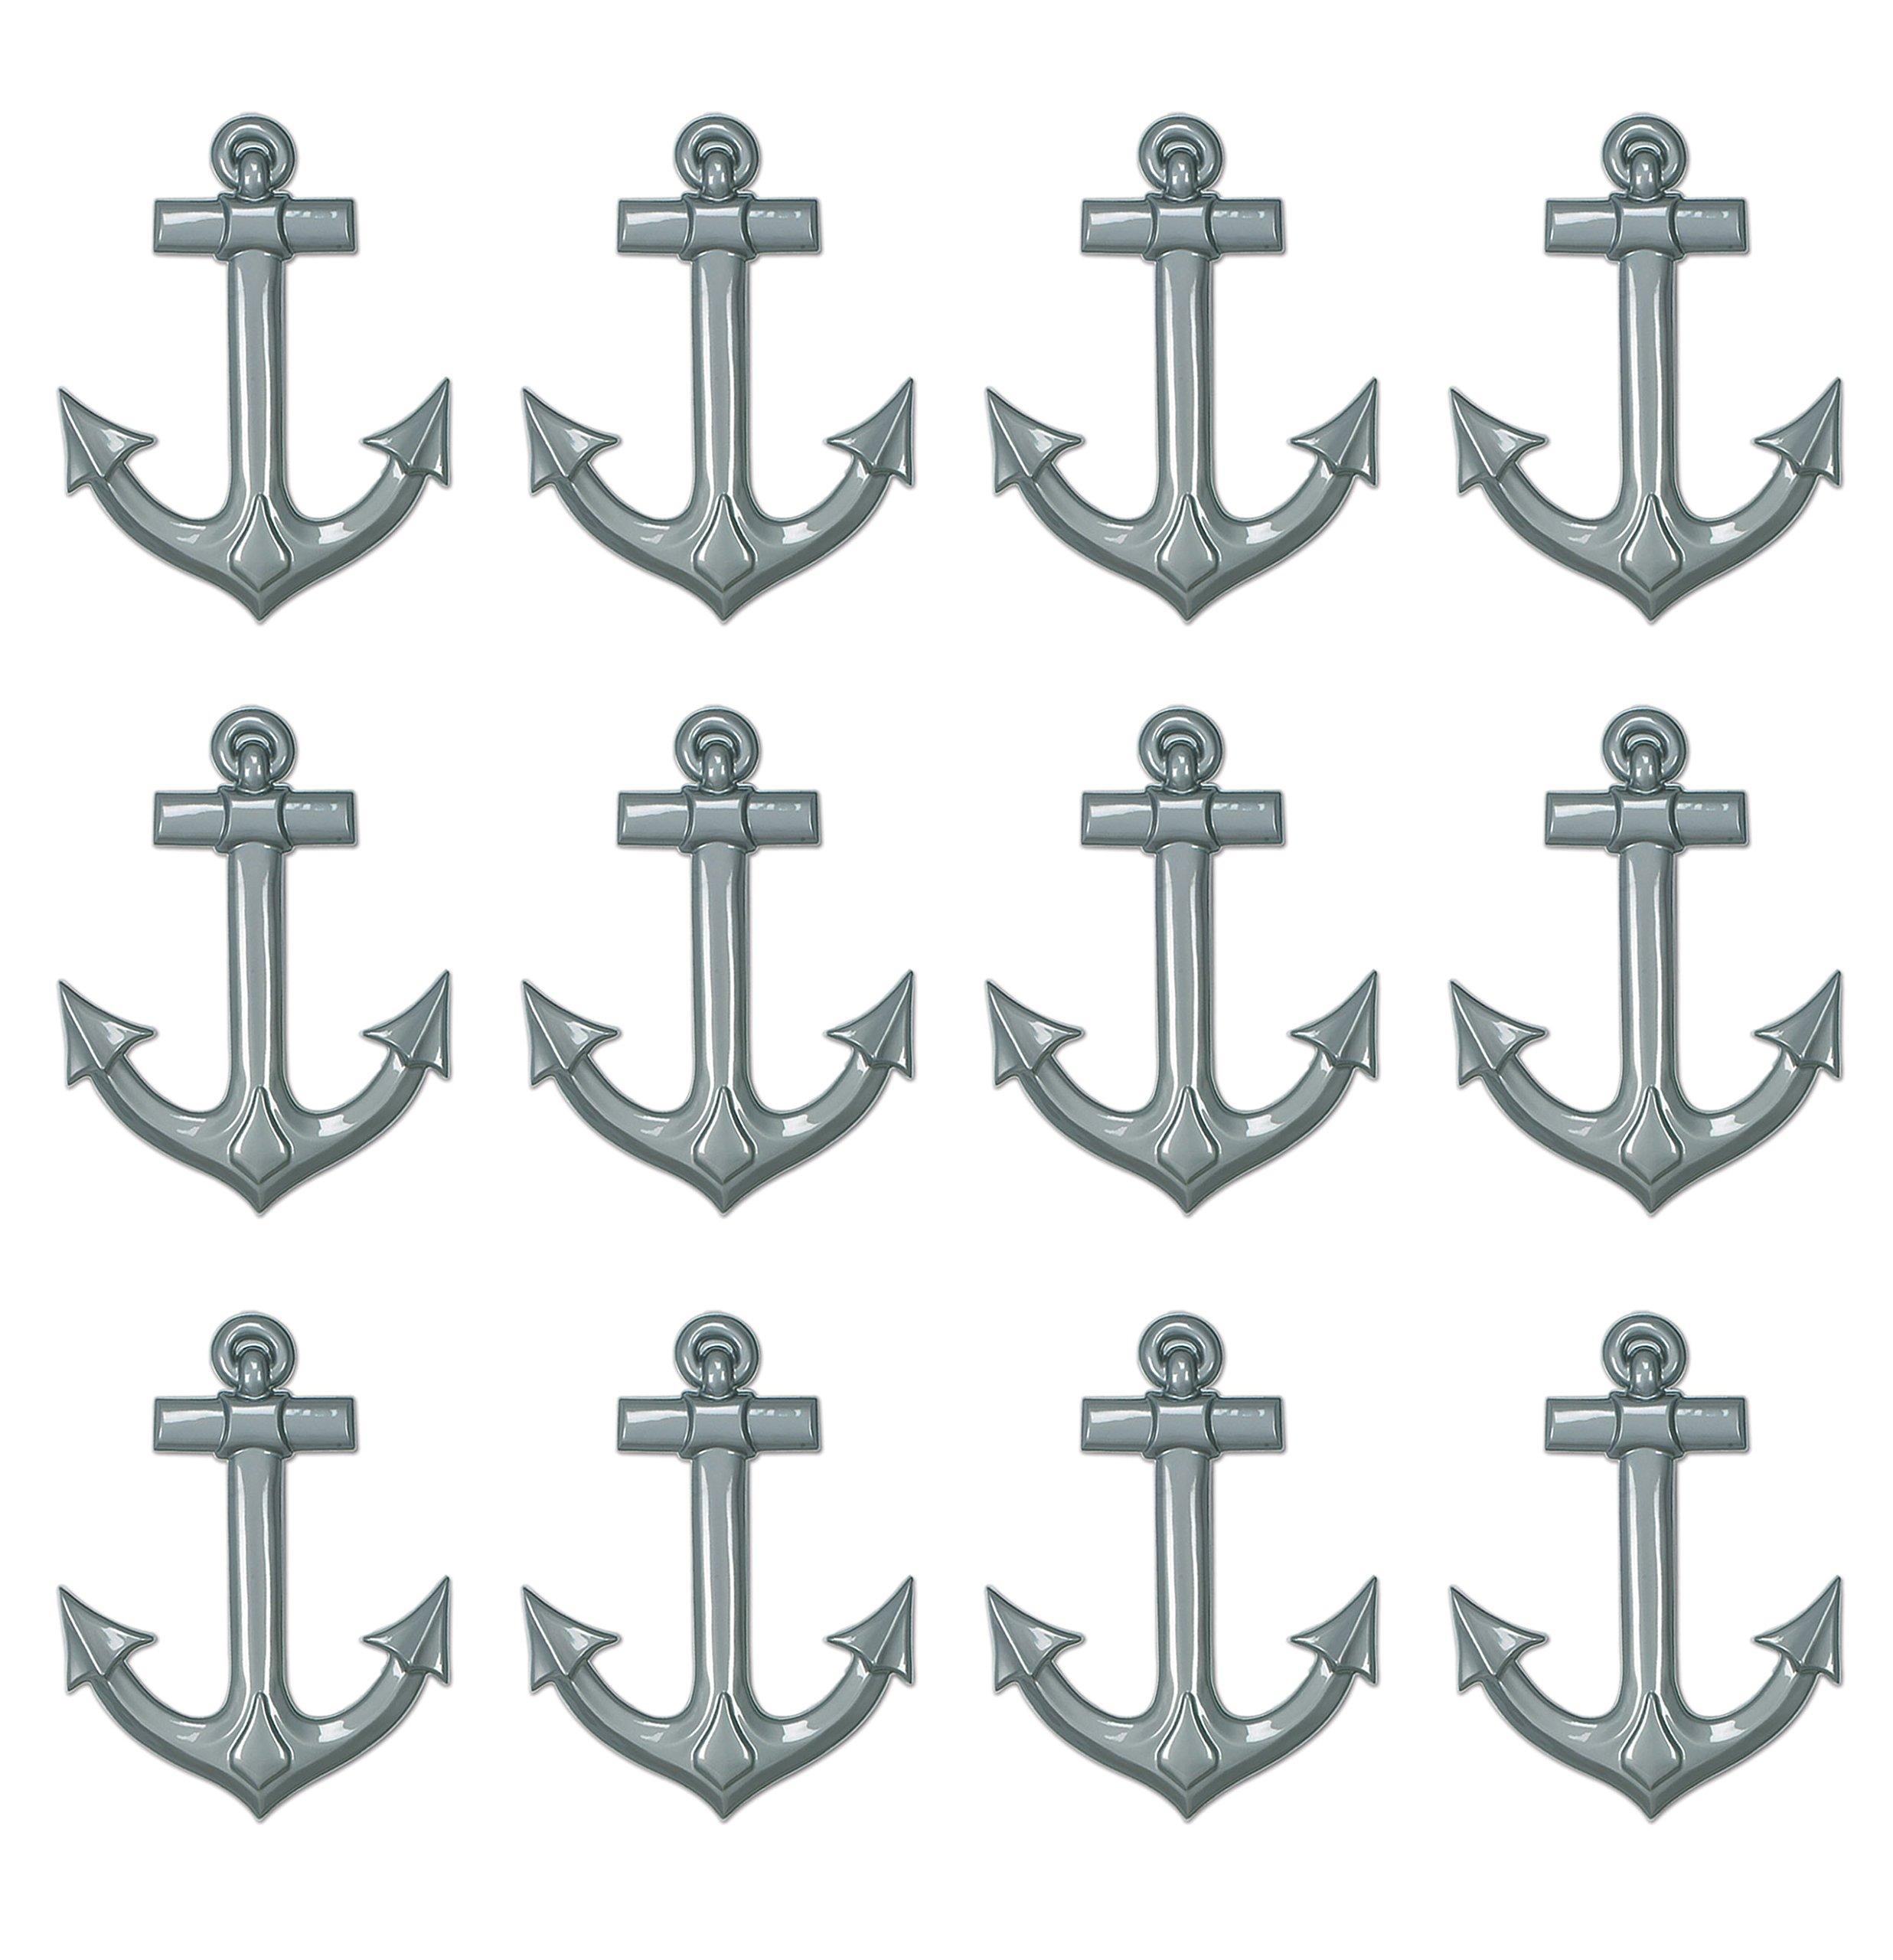 Beistle S55501AZ12 12 Piece Plastic Ship's Anchors, 25'', Gray